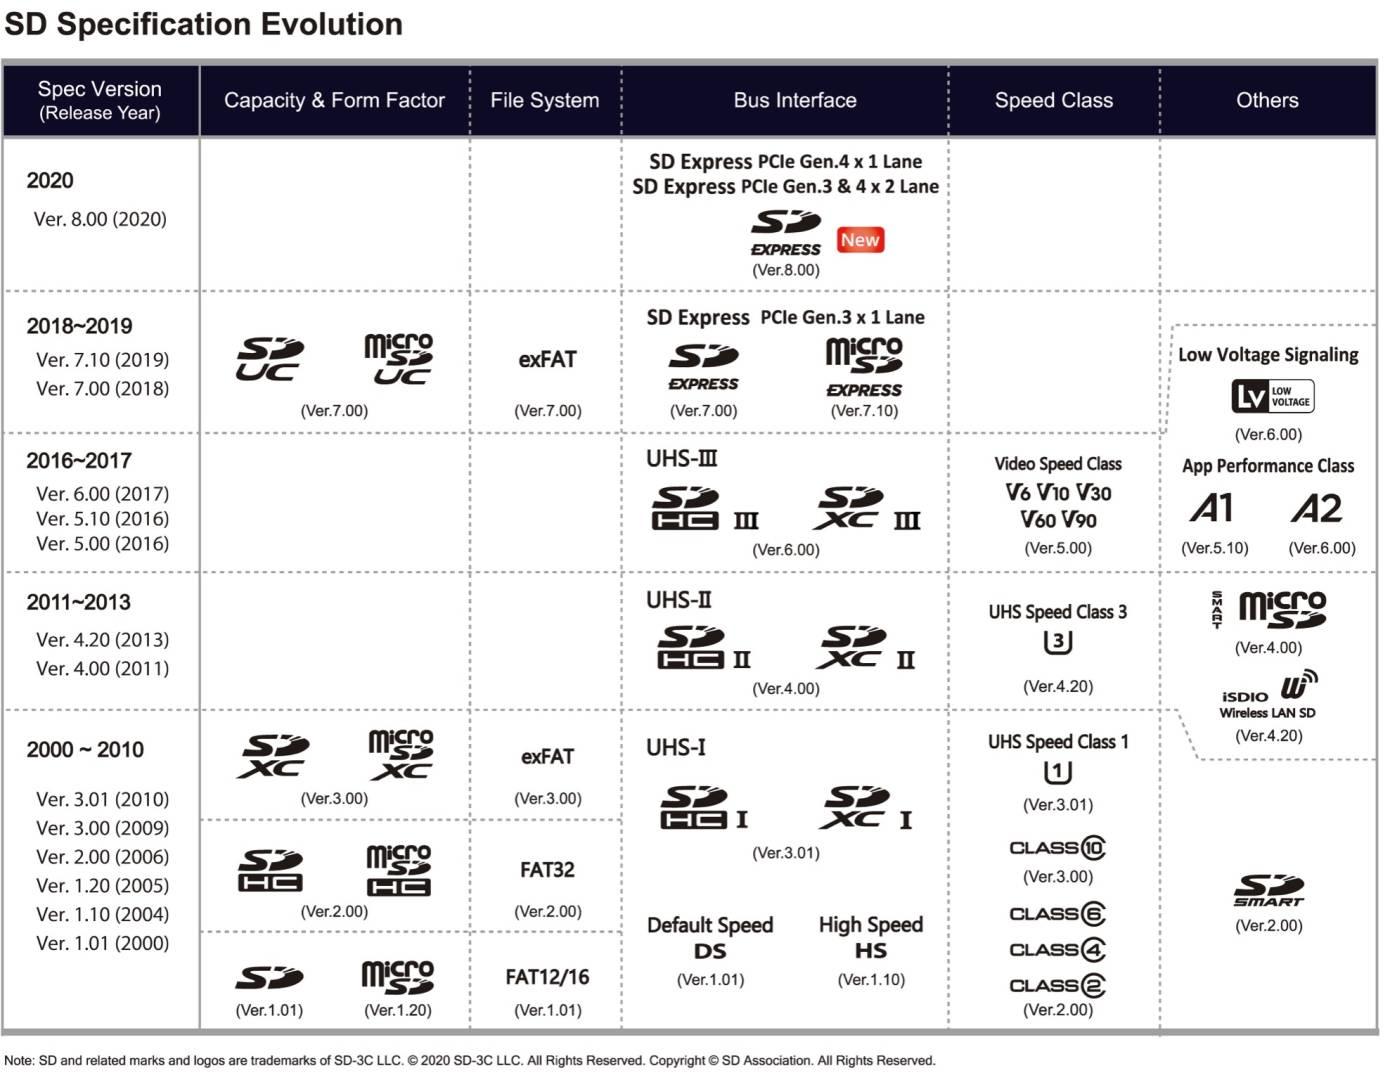 SD standard evolution